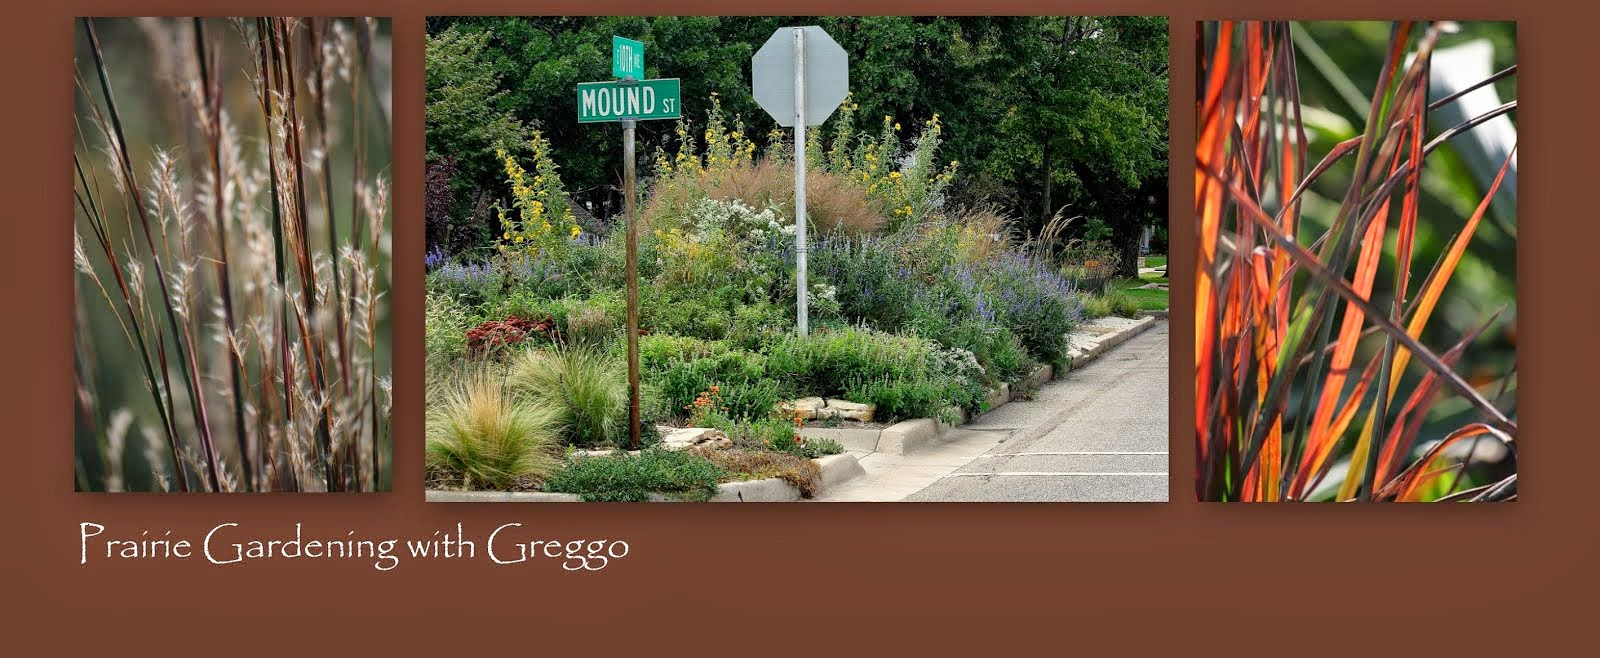 Gardening with Greggo